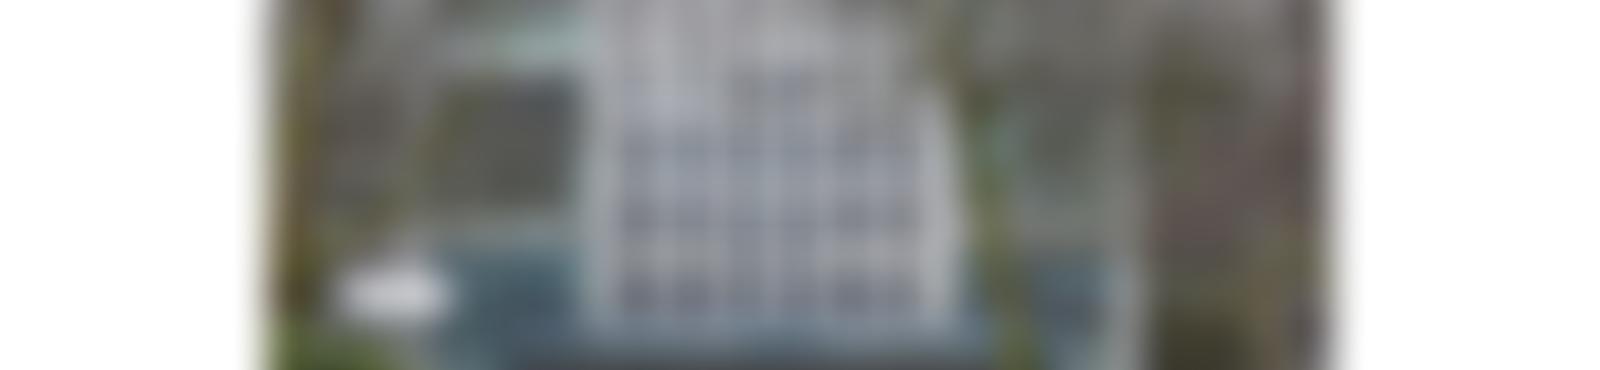 Blurred a0ab8dca 5a5c 4bdd 9c71 aac1cf213dee